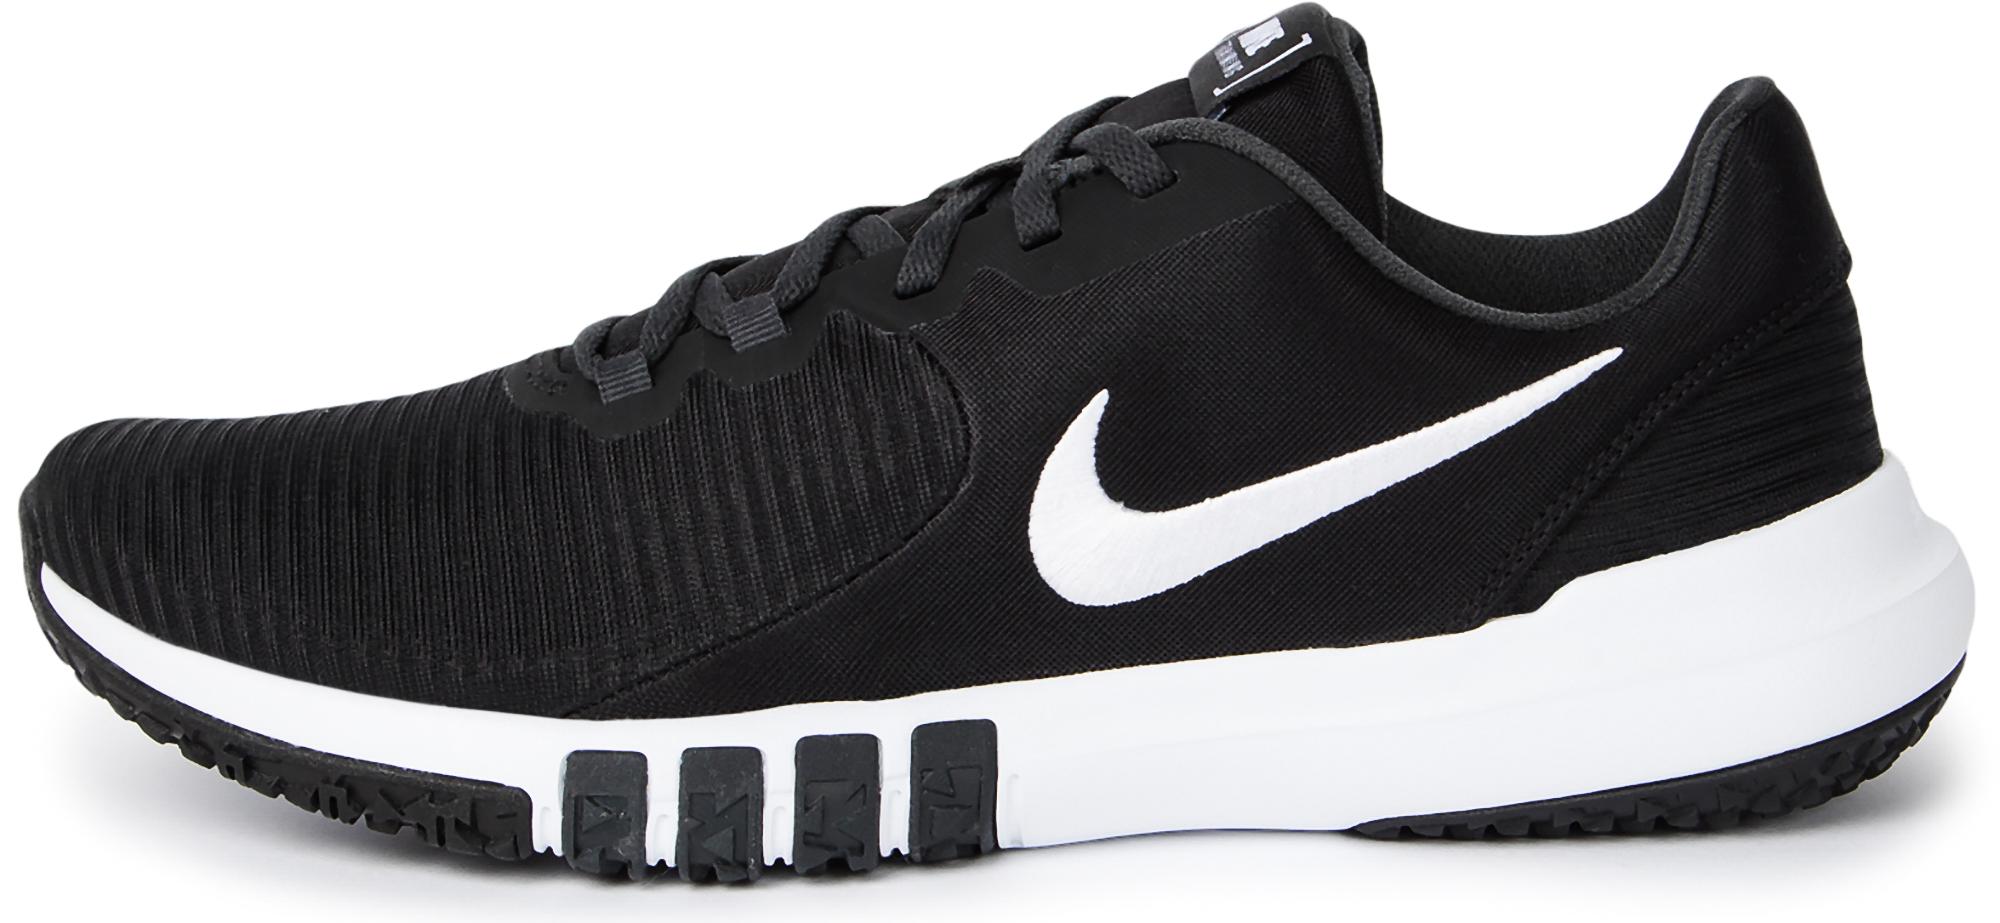 Nike Кроссовки мужские Nike Flex Control 4, размер 41 цена 2017